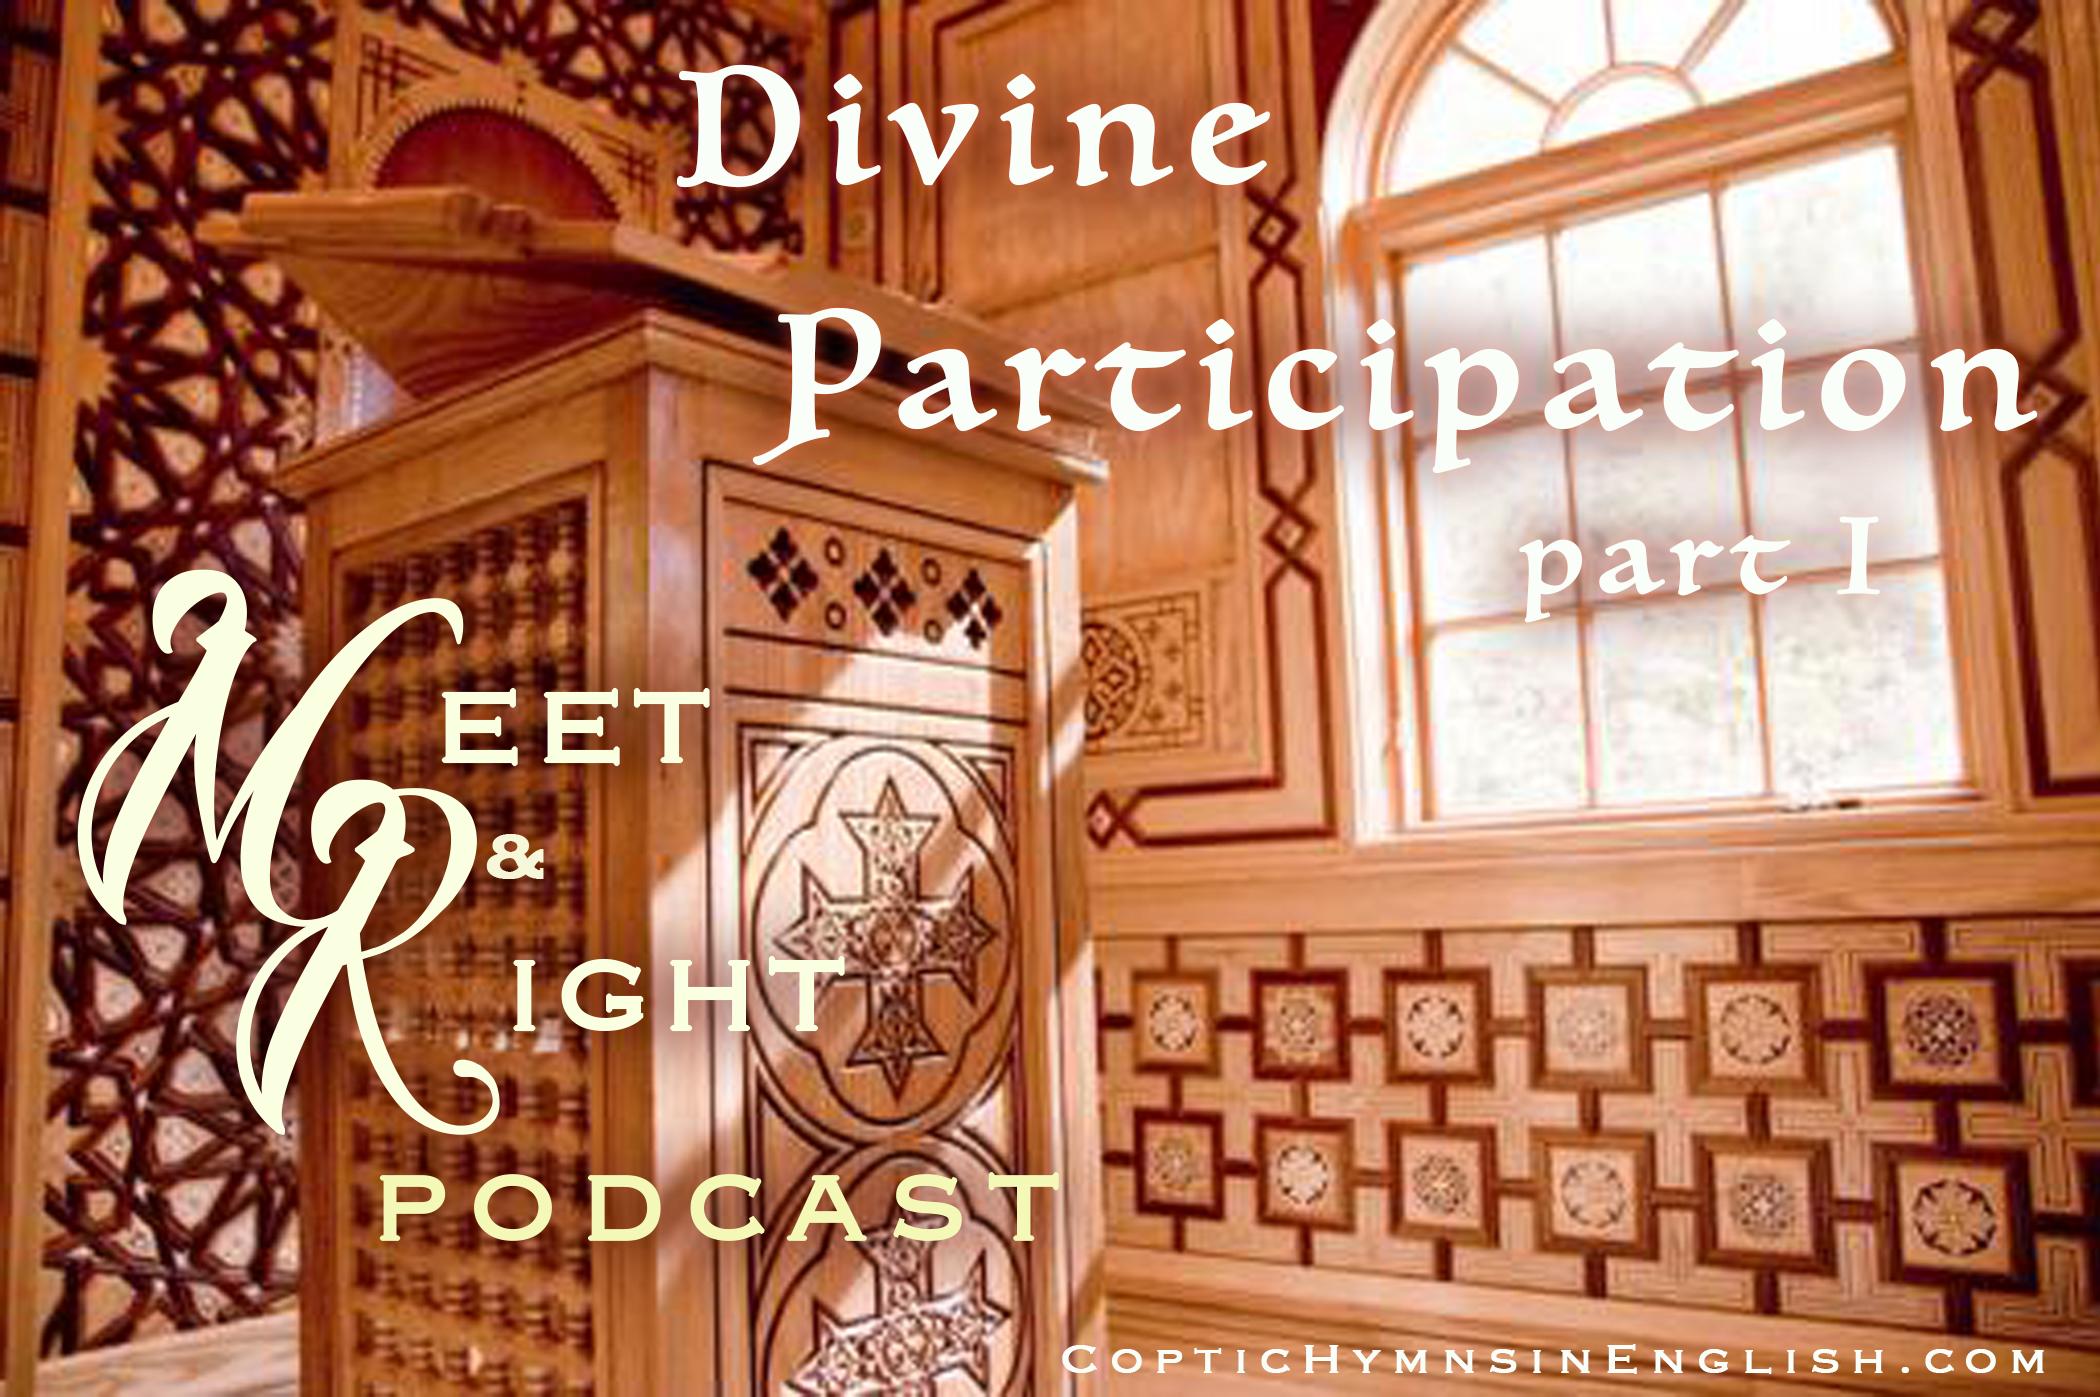 Divine Participation AD.jpg